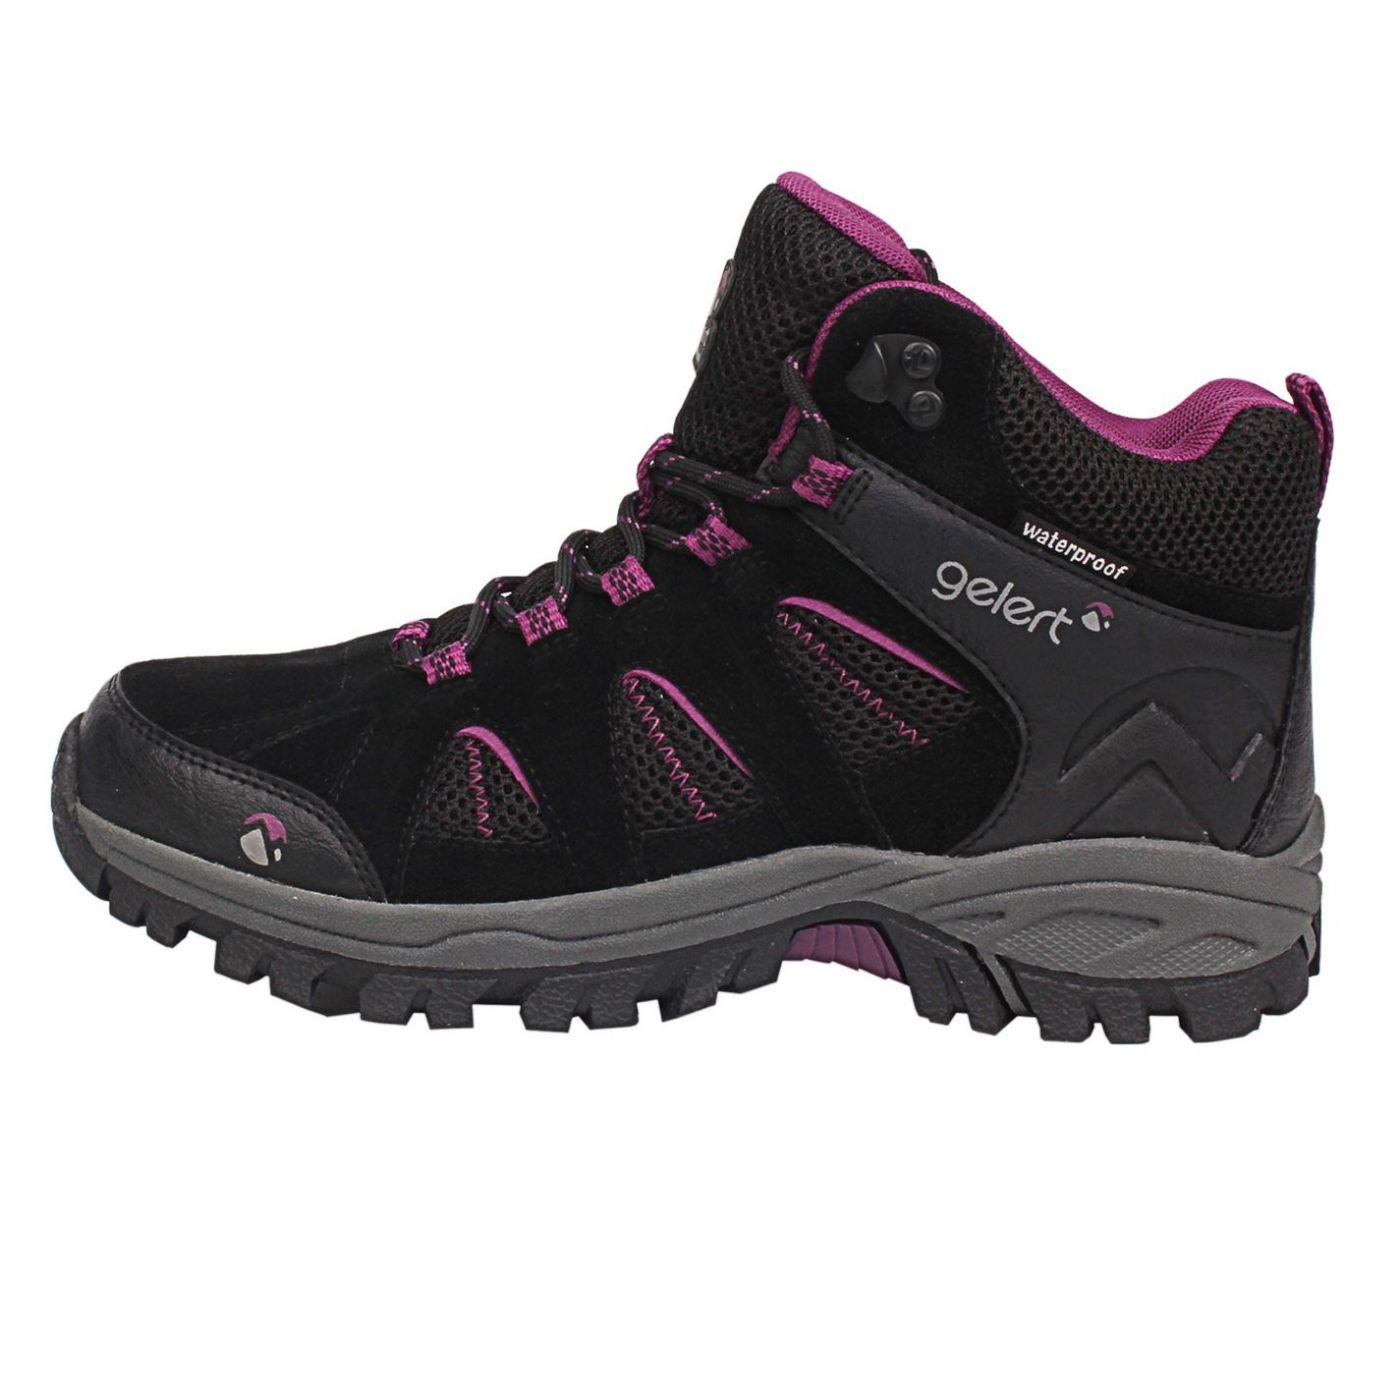 Gelert Tryfan Mid Waterproof Ladies Walking Boots